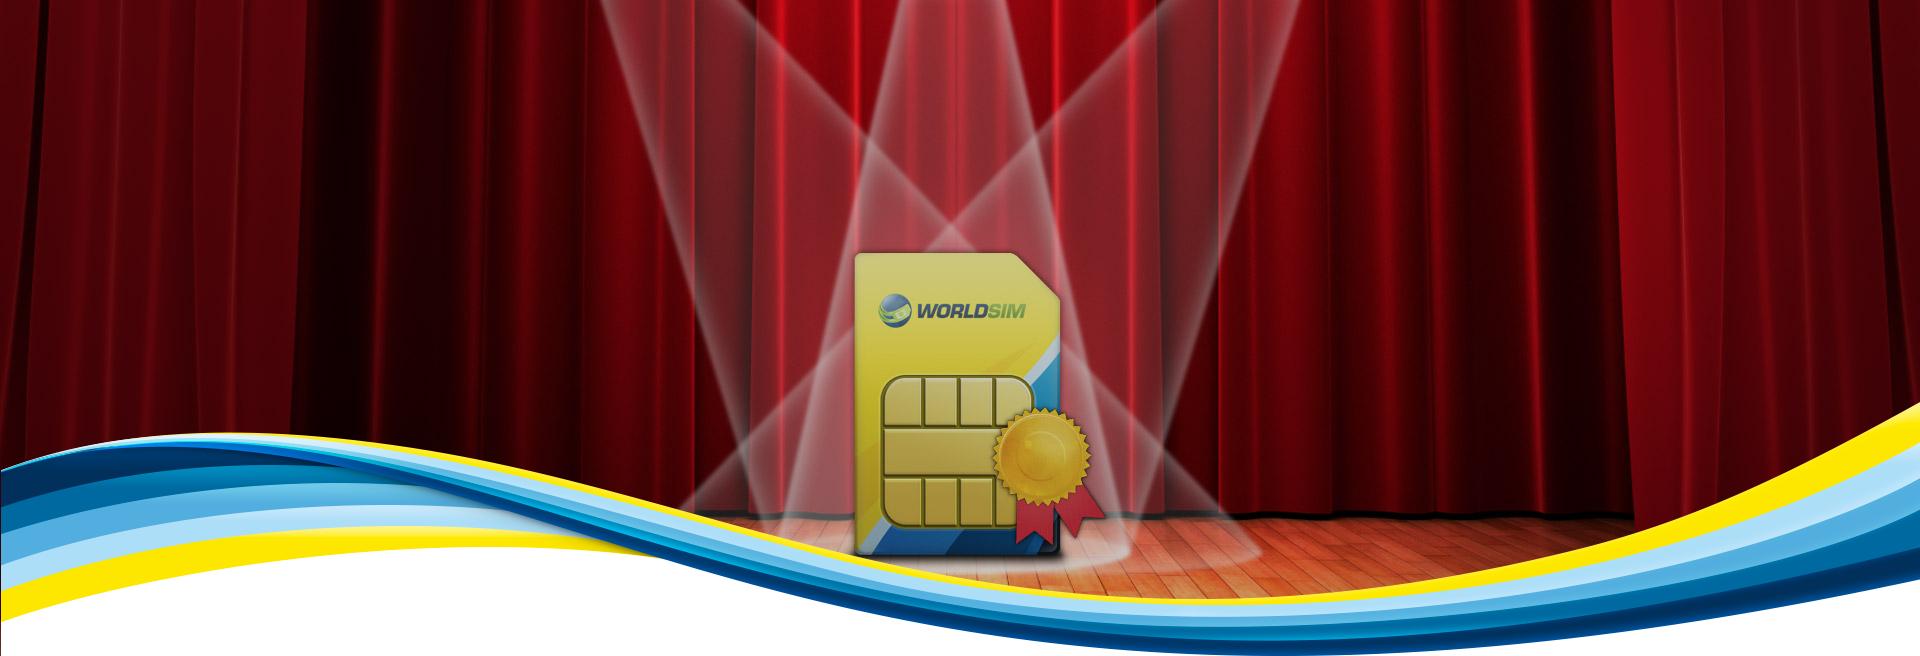 WorldSIM - our awards